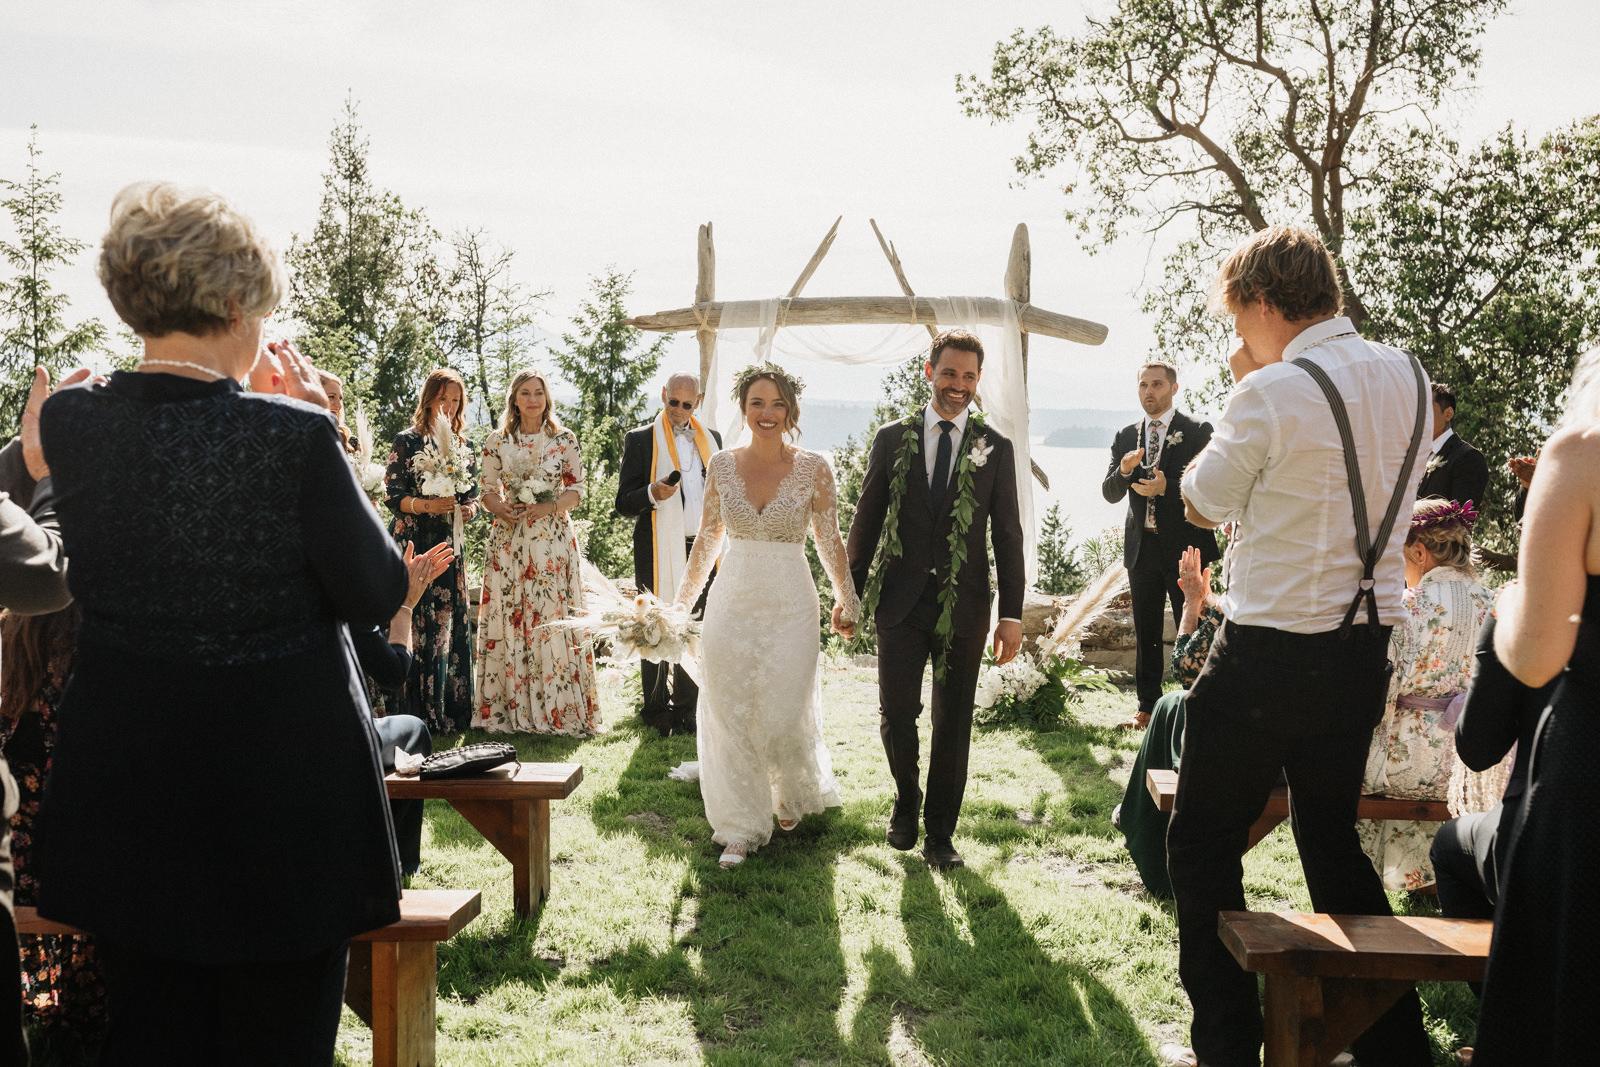 Bodega Ridge Galiano Island Wedding Photographer Kim Jay-76.jpg